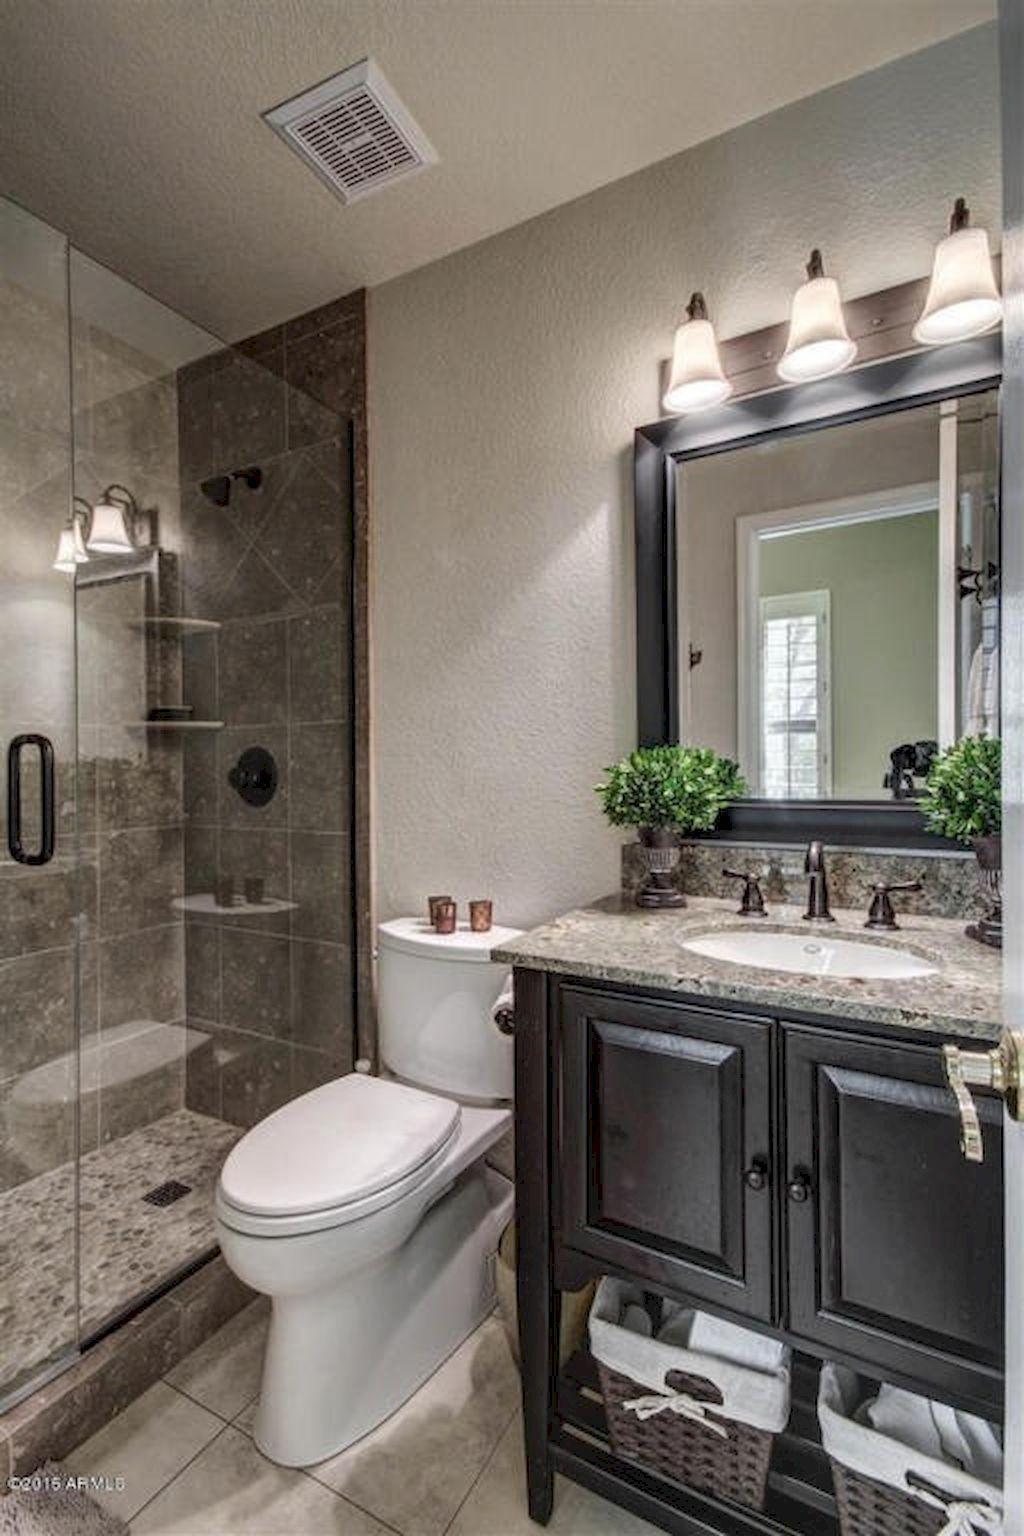 55 Cool Small Master Bathroom Remodel Ideas  Master Bathrooms Cool Building A Small Bathroom 2018